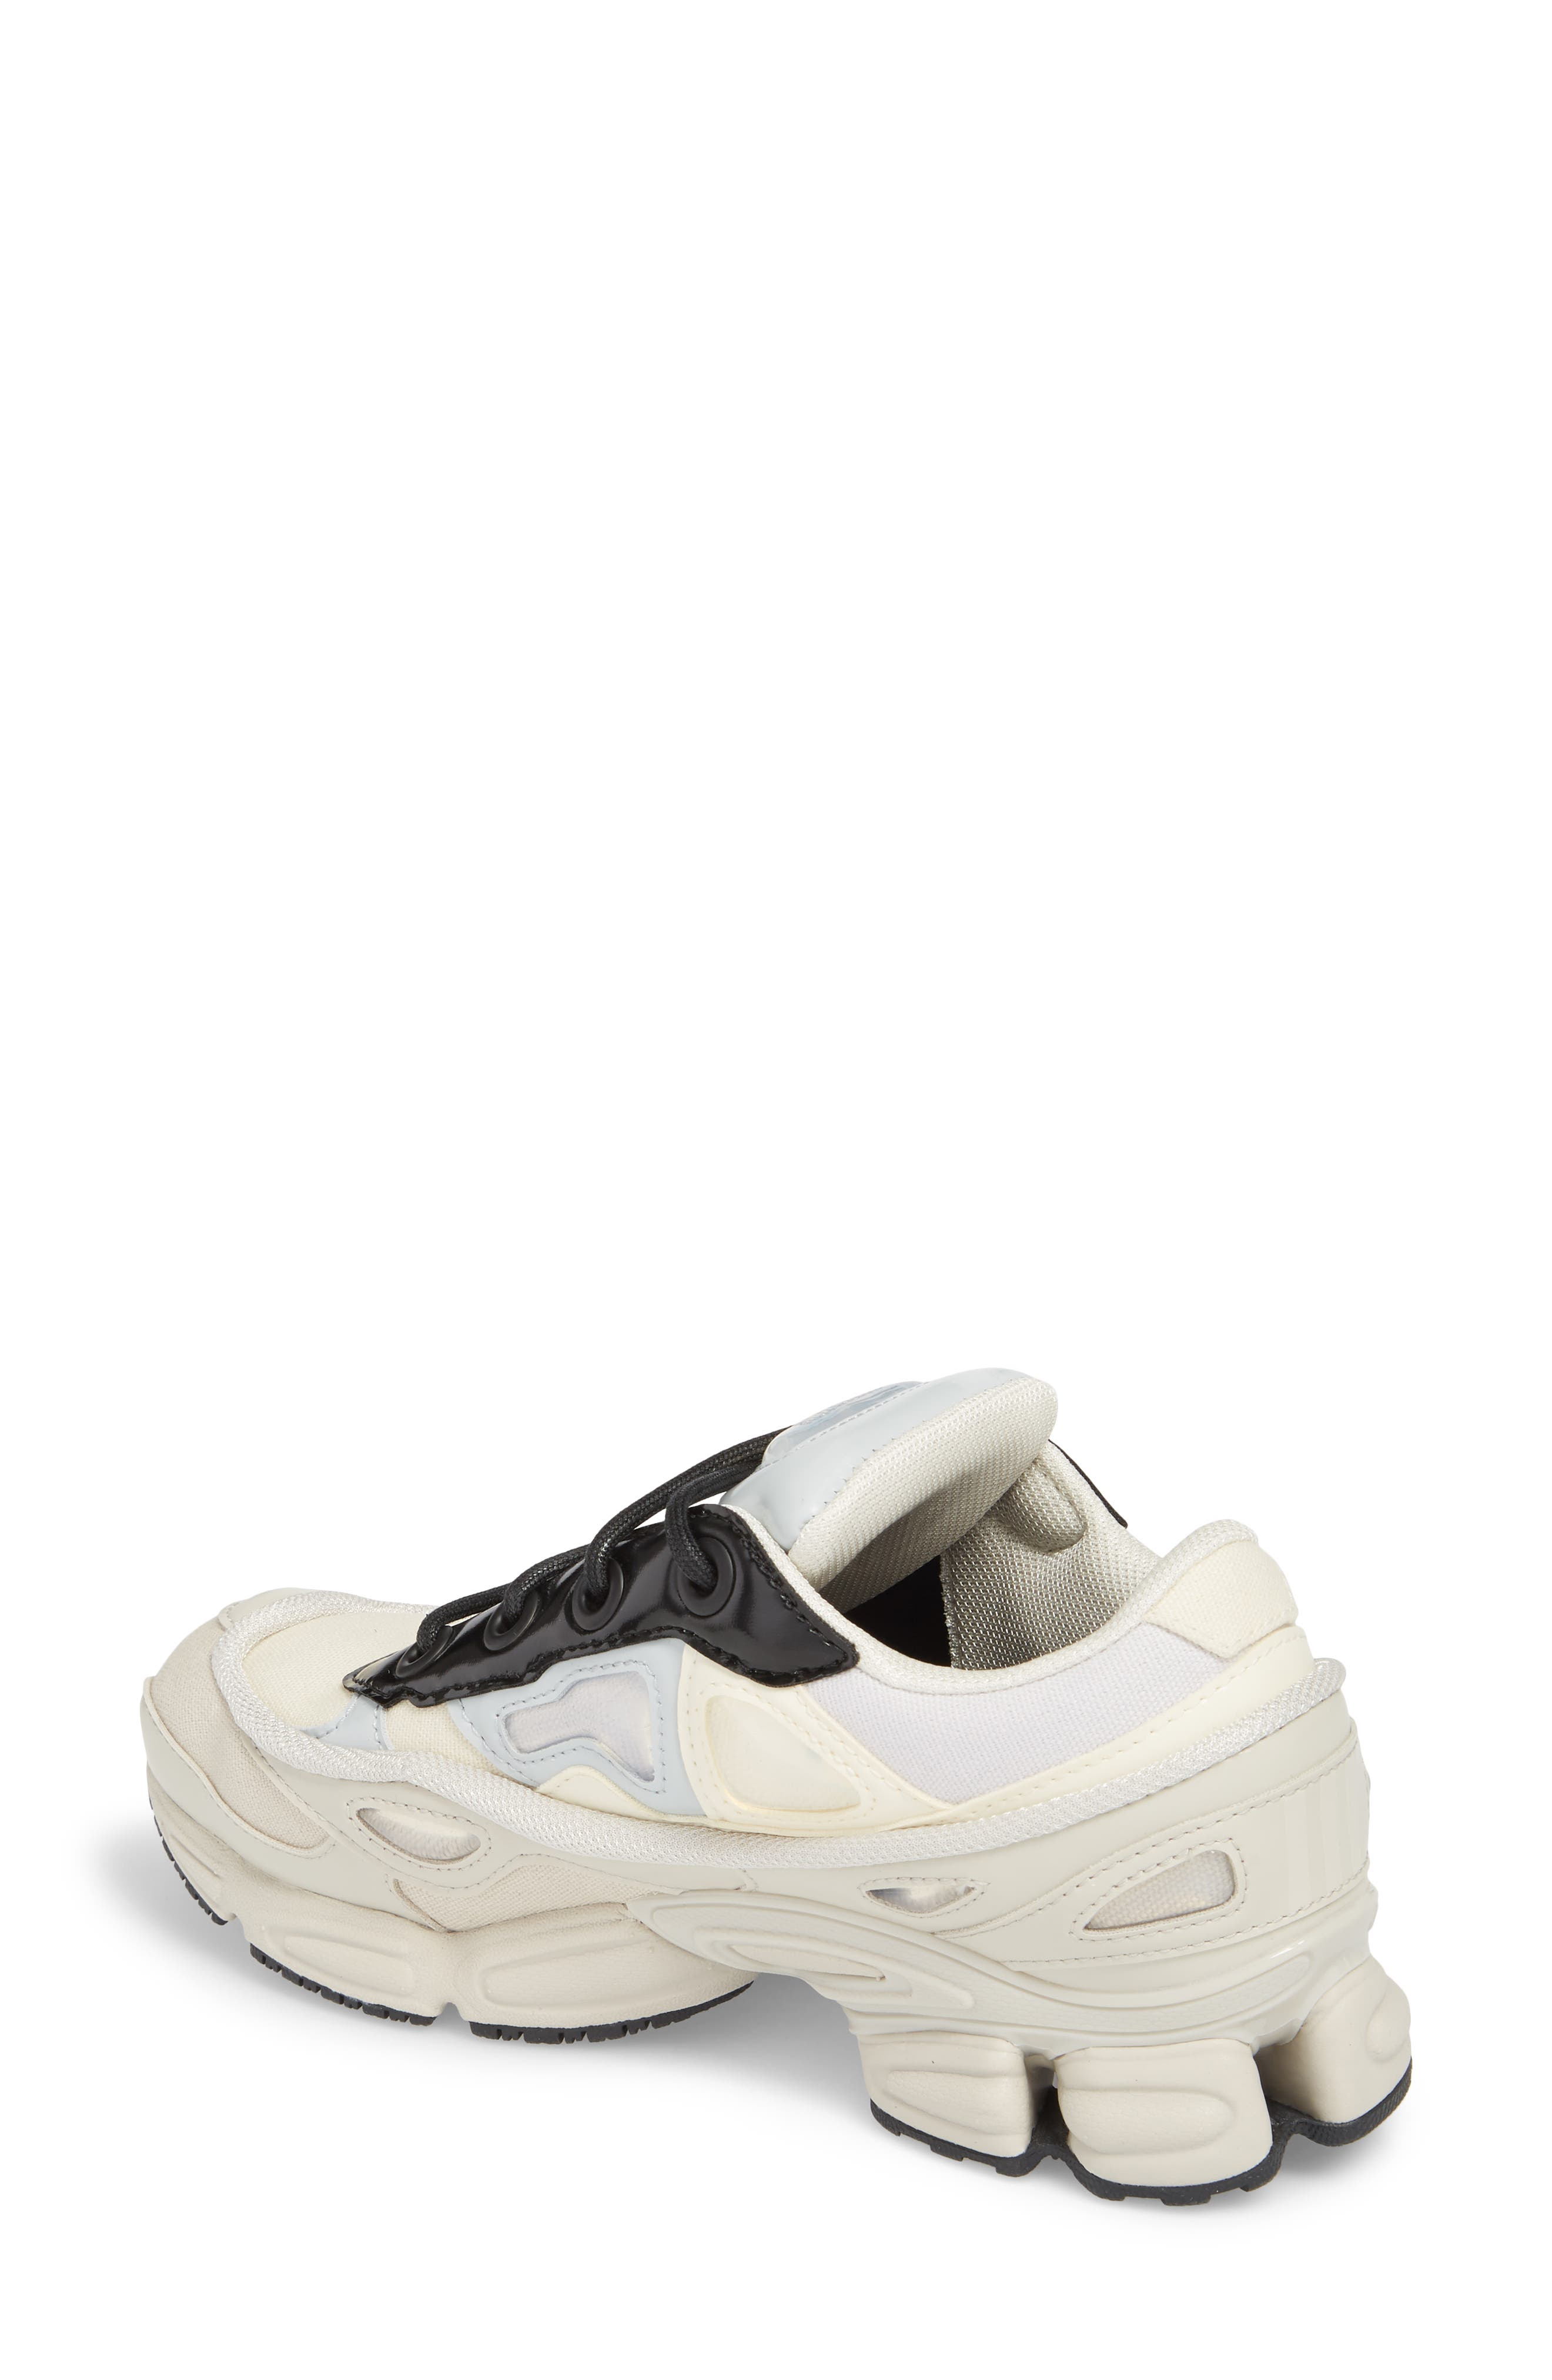 adidas by Raf Simons Ozweego III Sneaker,                             Alternate thumbnail 2, color,                             150